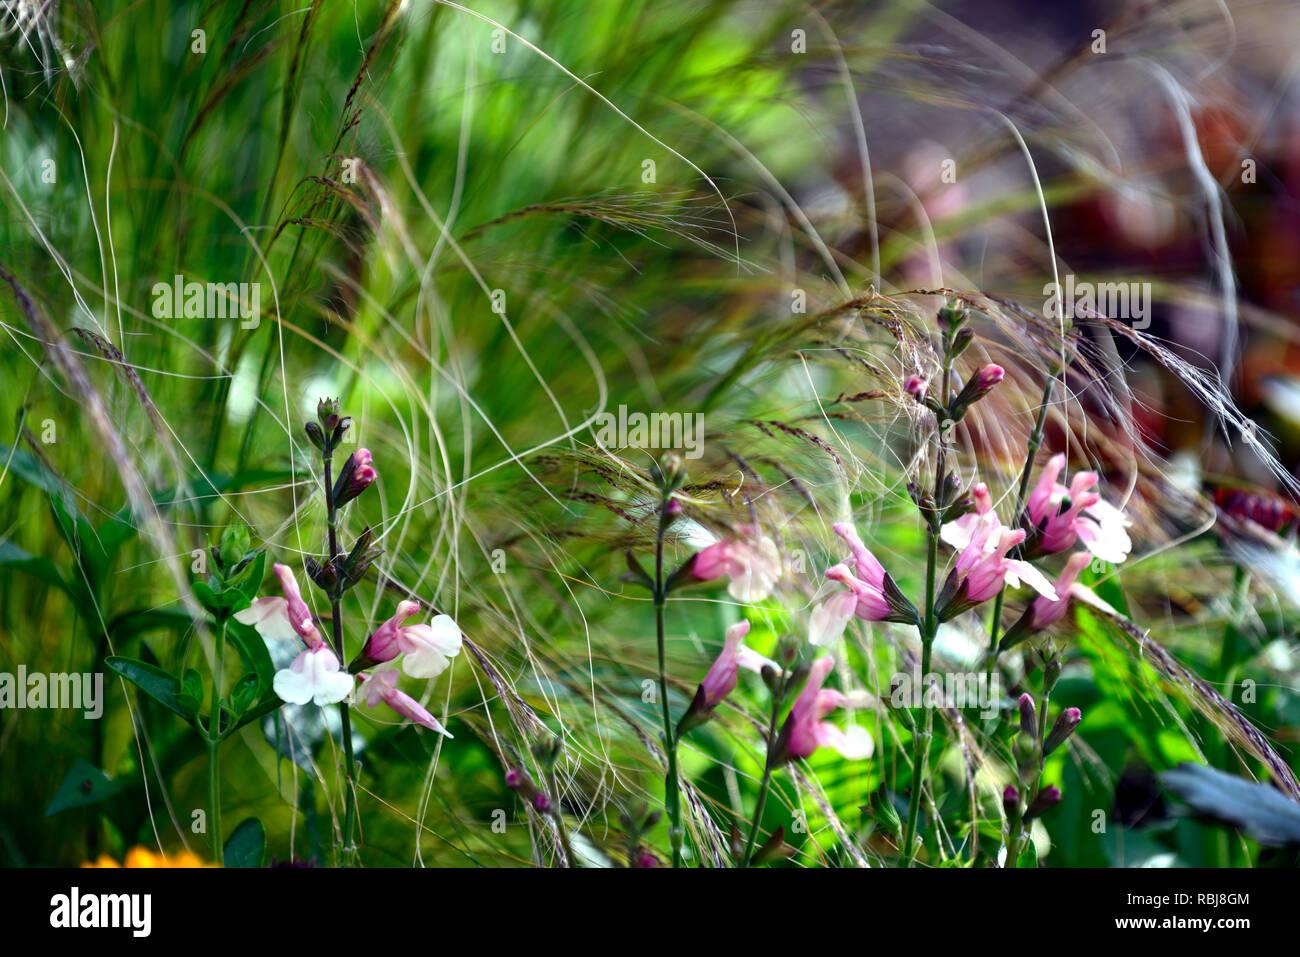 salvia x jamensis sierra san antonio,sages,sage,salvias,scented,bicoloured creamy yellow peach flowers,combination,grasses,grass,mix,mixed,RM Floral Stock Photo